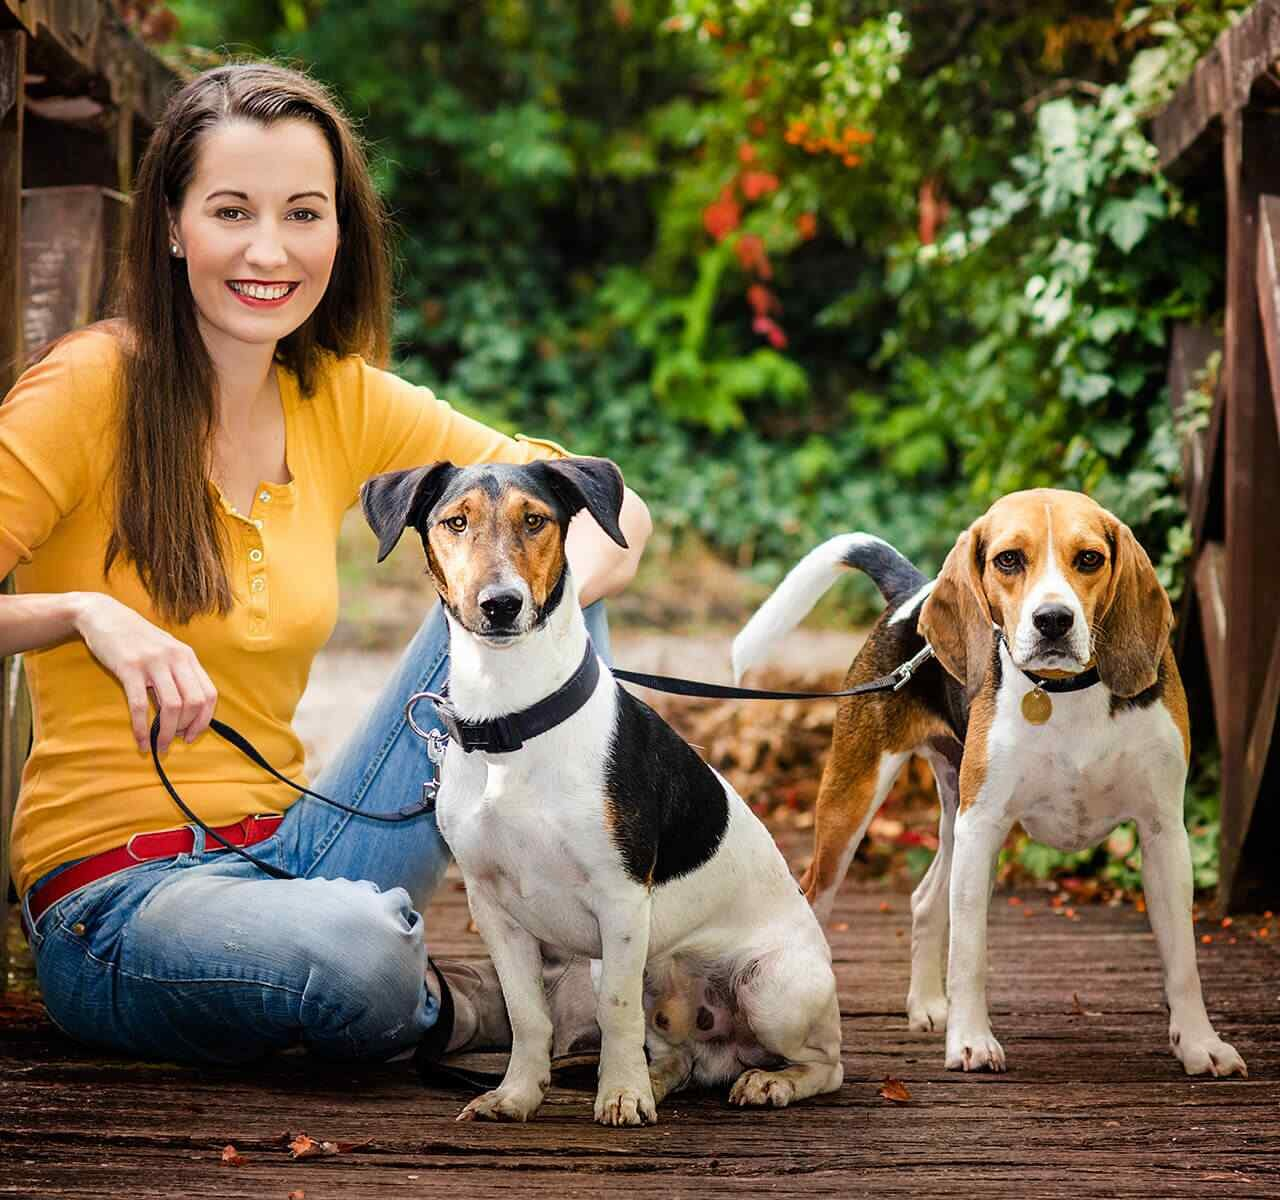 http://www.dog-adoptions.com/wp-content/uploads/2018/09/post_02-1280x1200.jpg